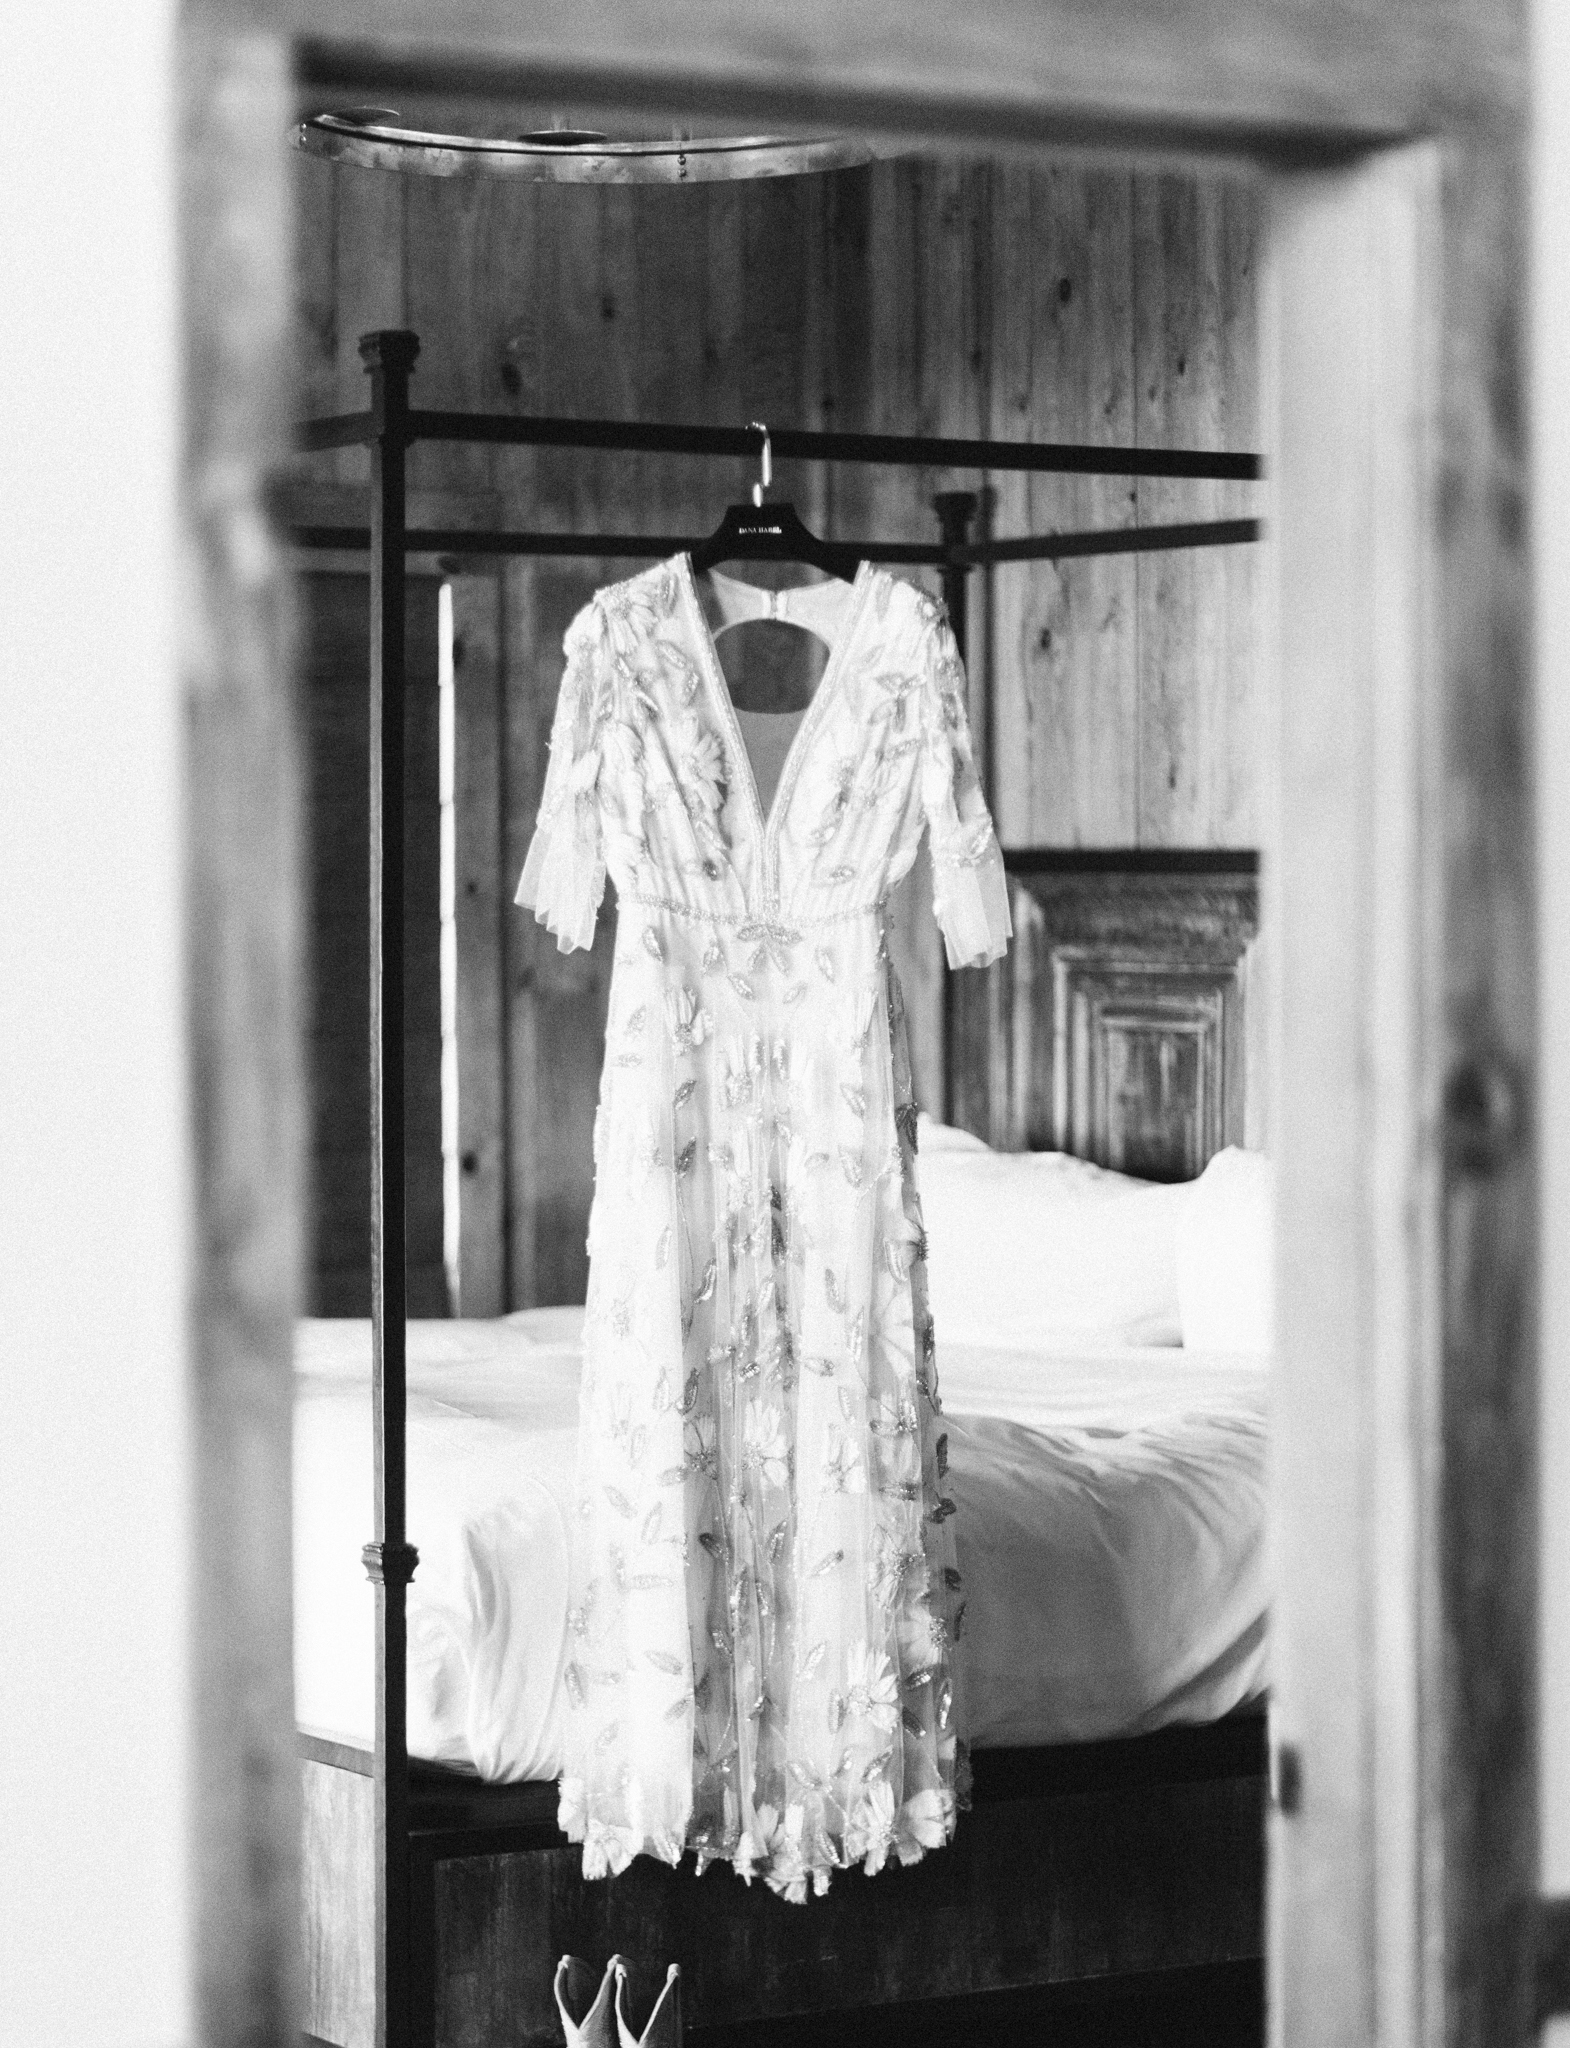 Devils-Thumb-Ranch-Tabernash-Colorado-Winter-Wedding-Dress